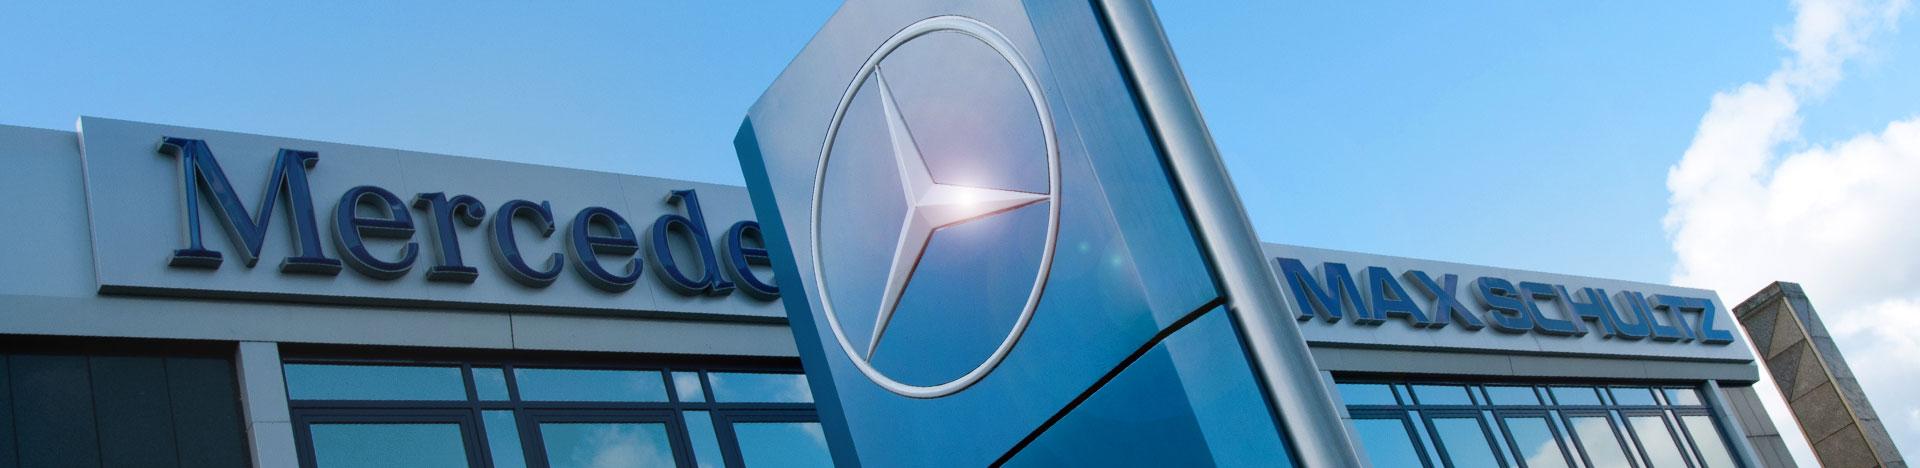 Mercedes Autohaus Max Schultz